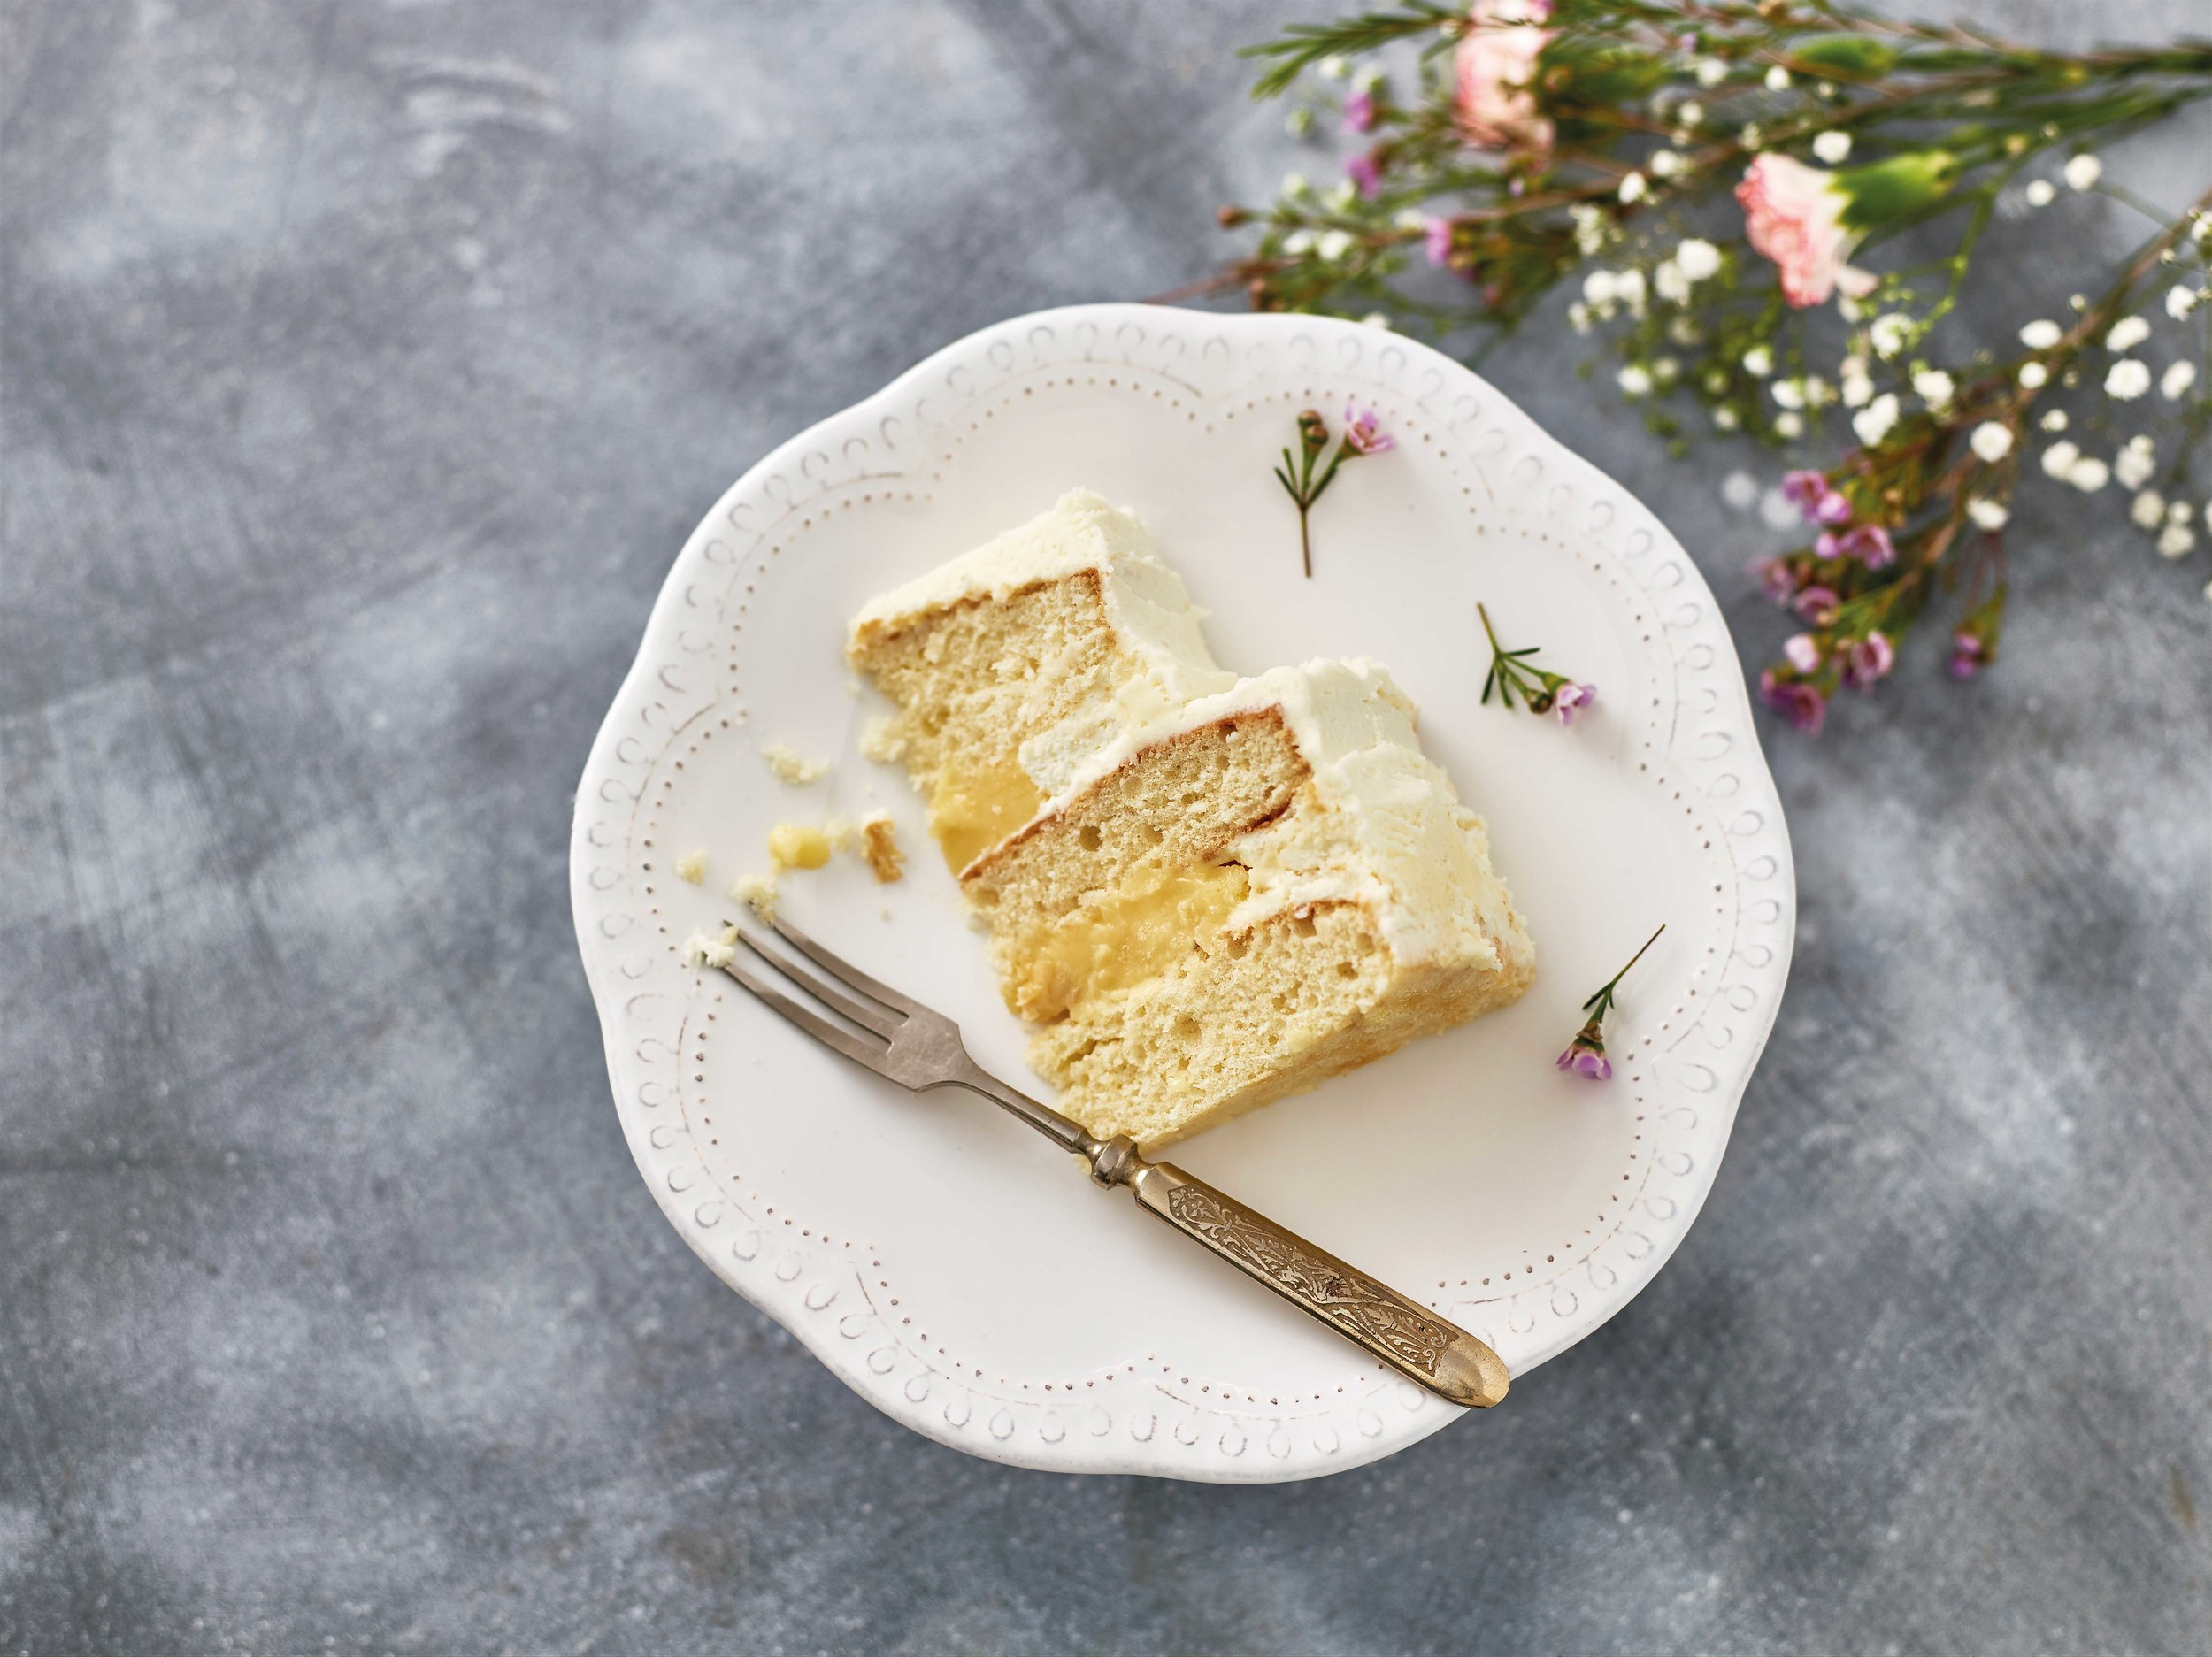 Iceland-_-Lemon-&-Elderflower-Wedding-Cake-Slice-_-Lifestyle.jpg